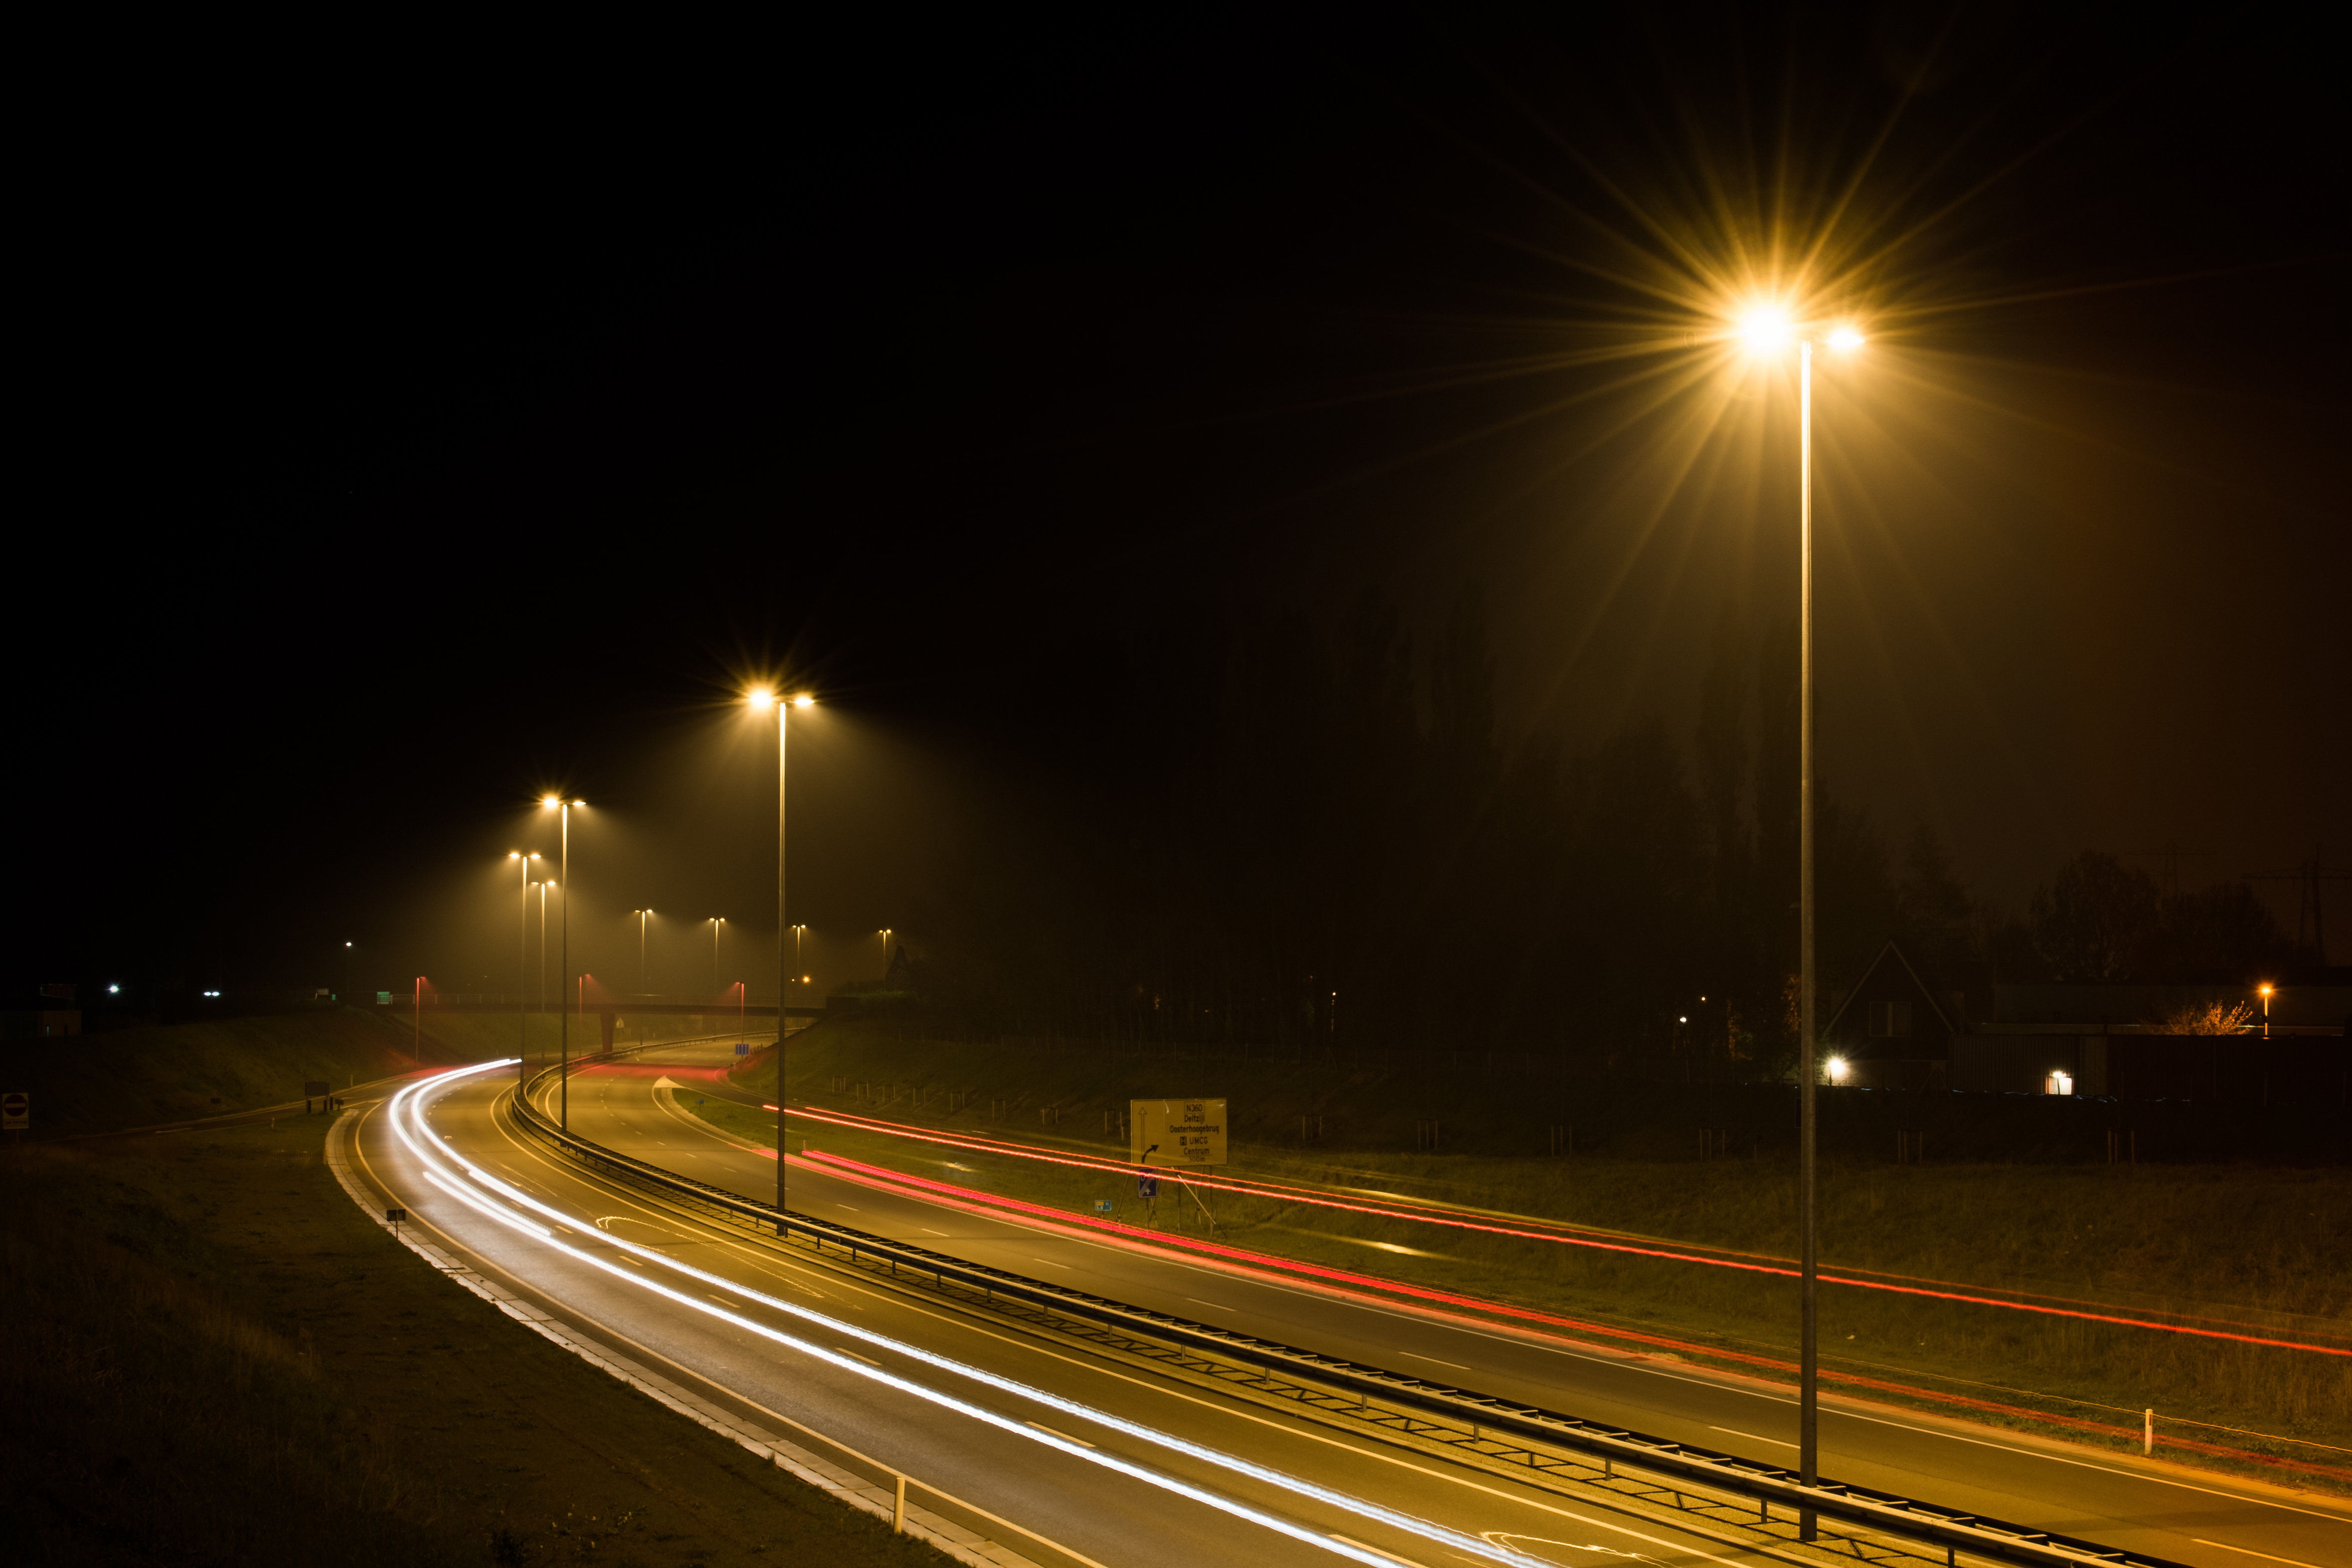 Free stock photo of car lights, dark, highway for Traffic Light On Road At Night  67qdu